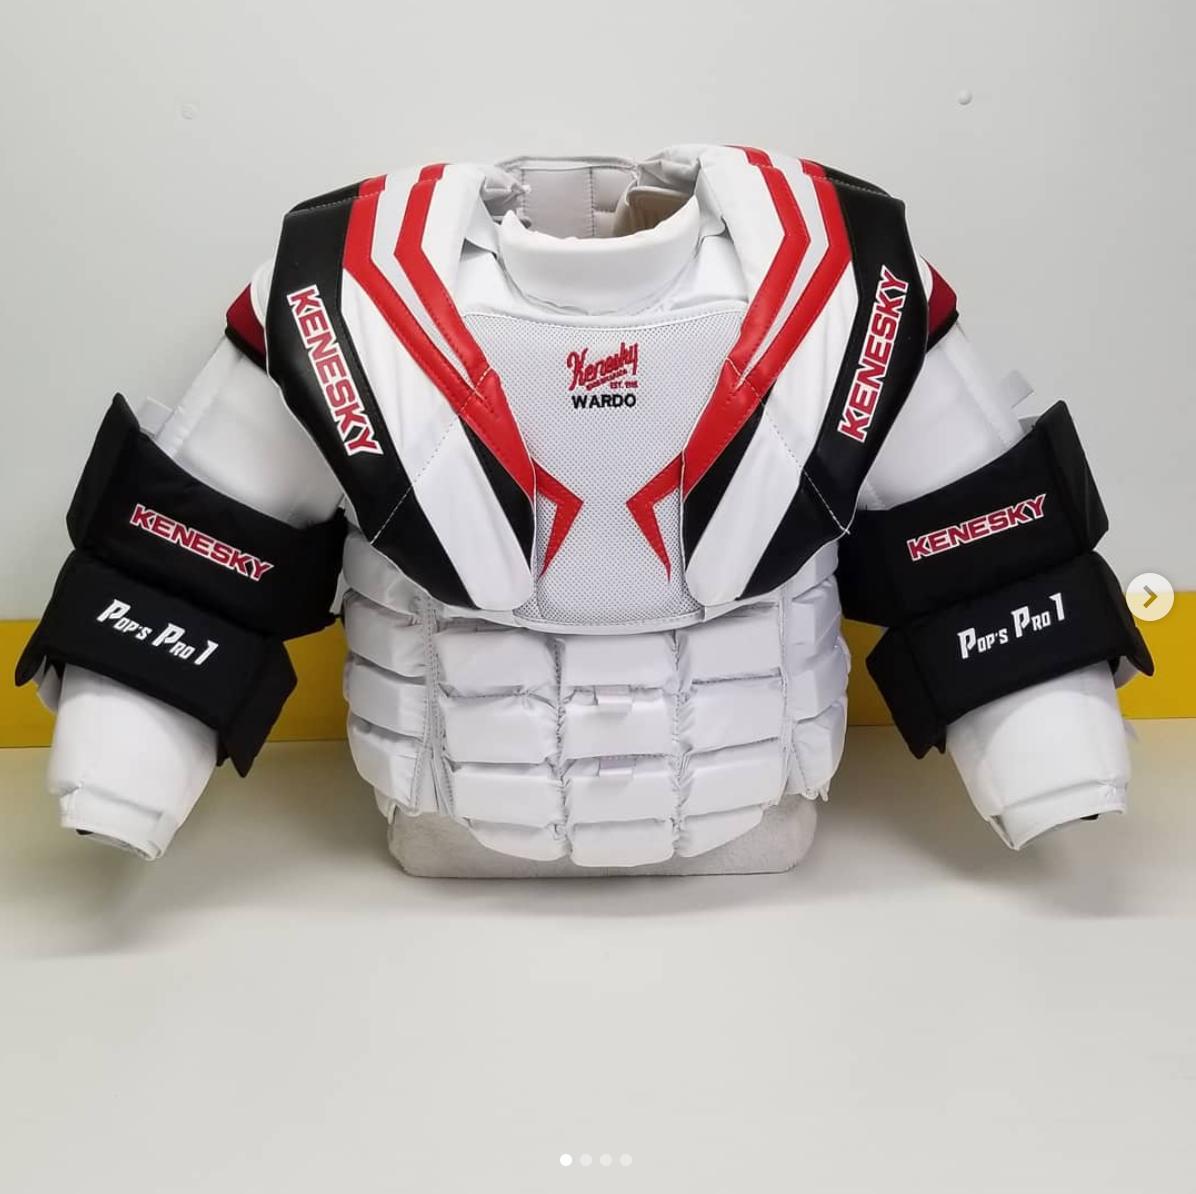 Kenesky in the NHL - Goal Equipment - ModSquadHockey 1c2d49141